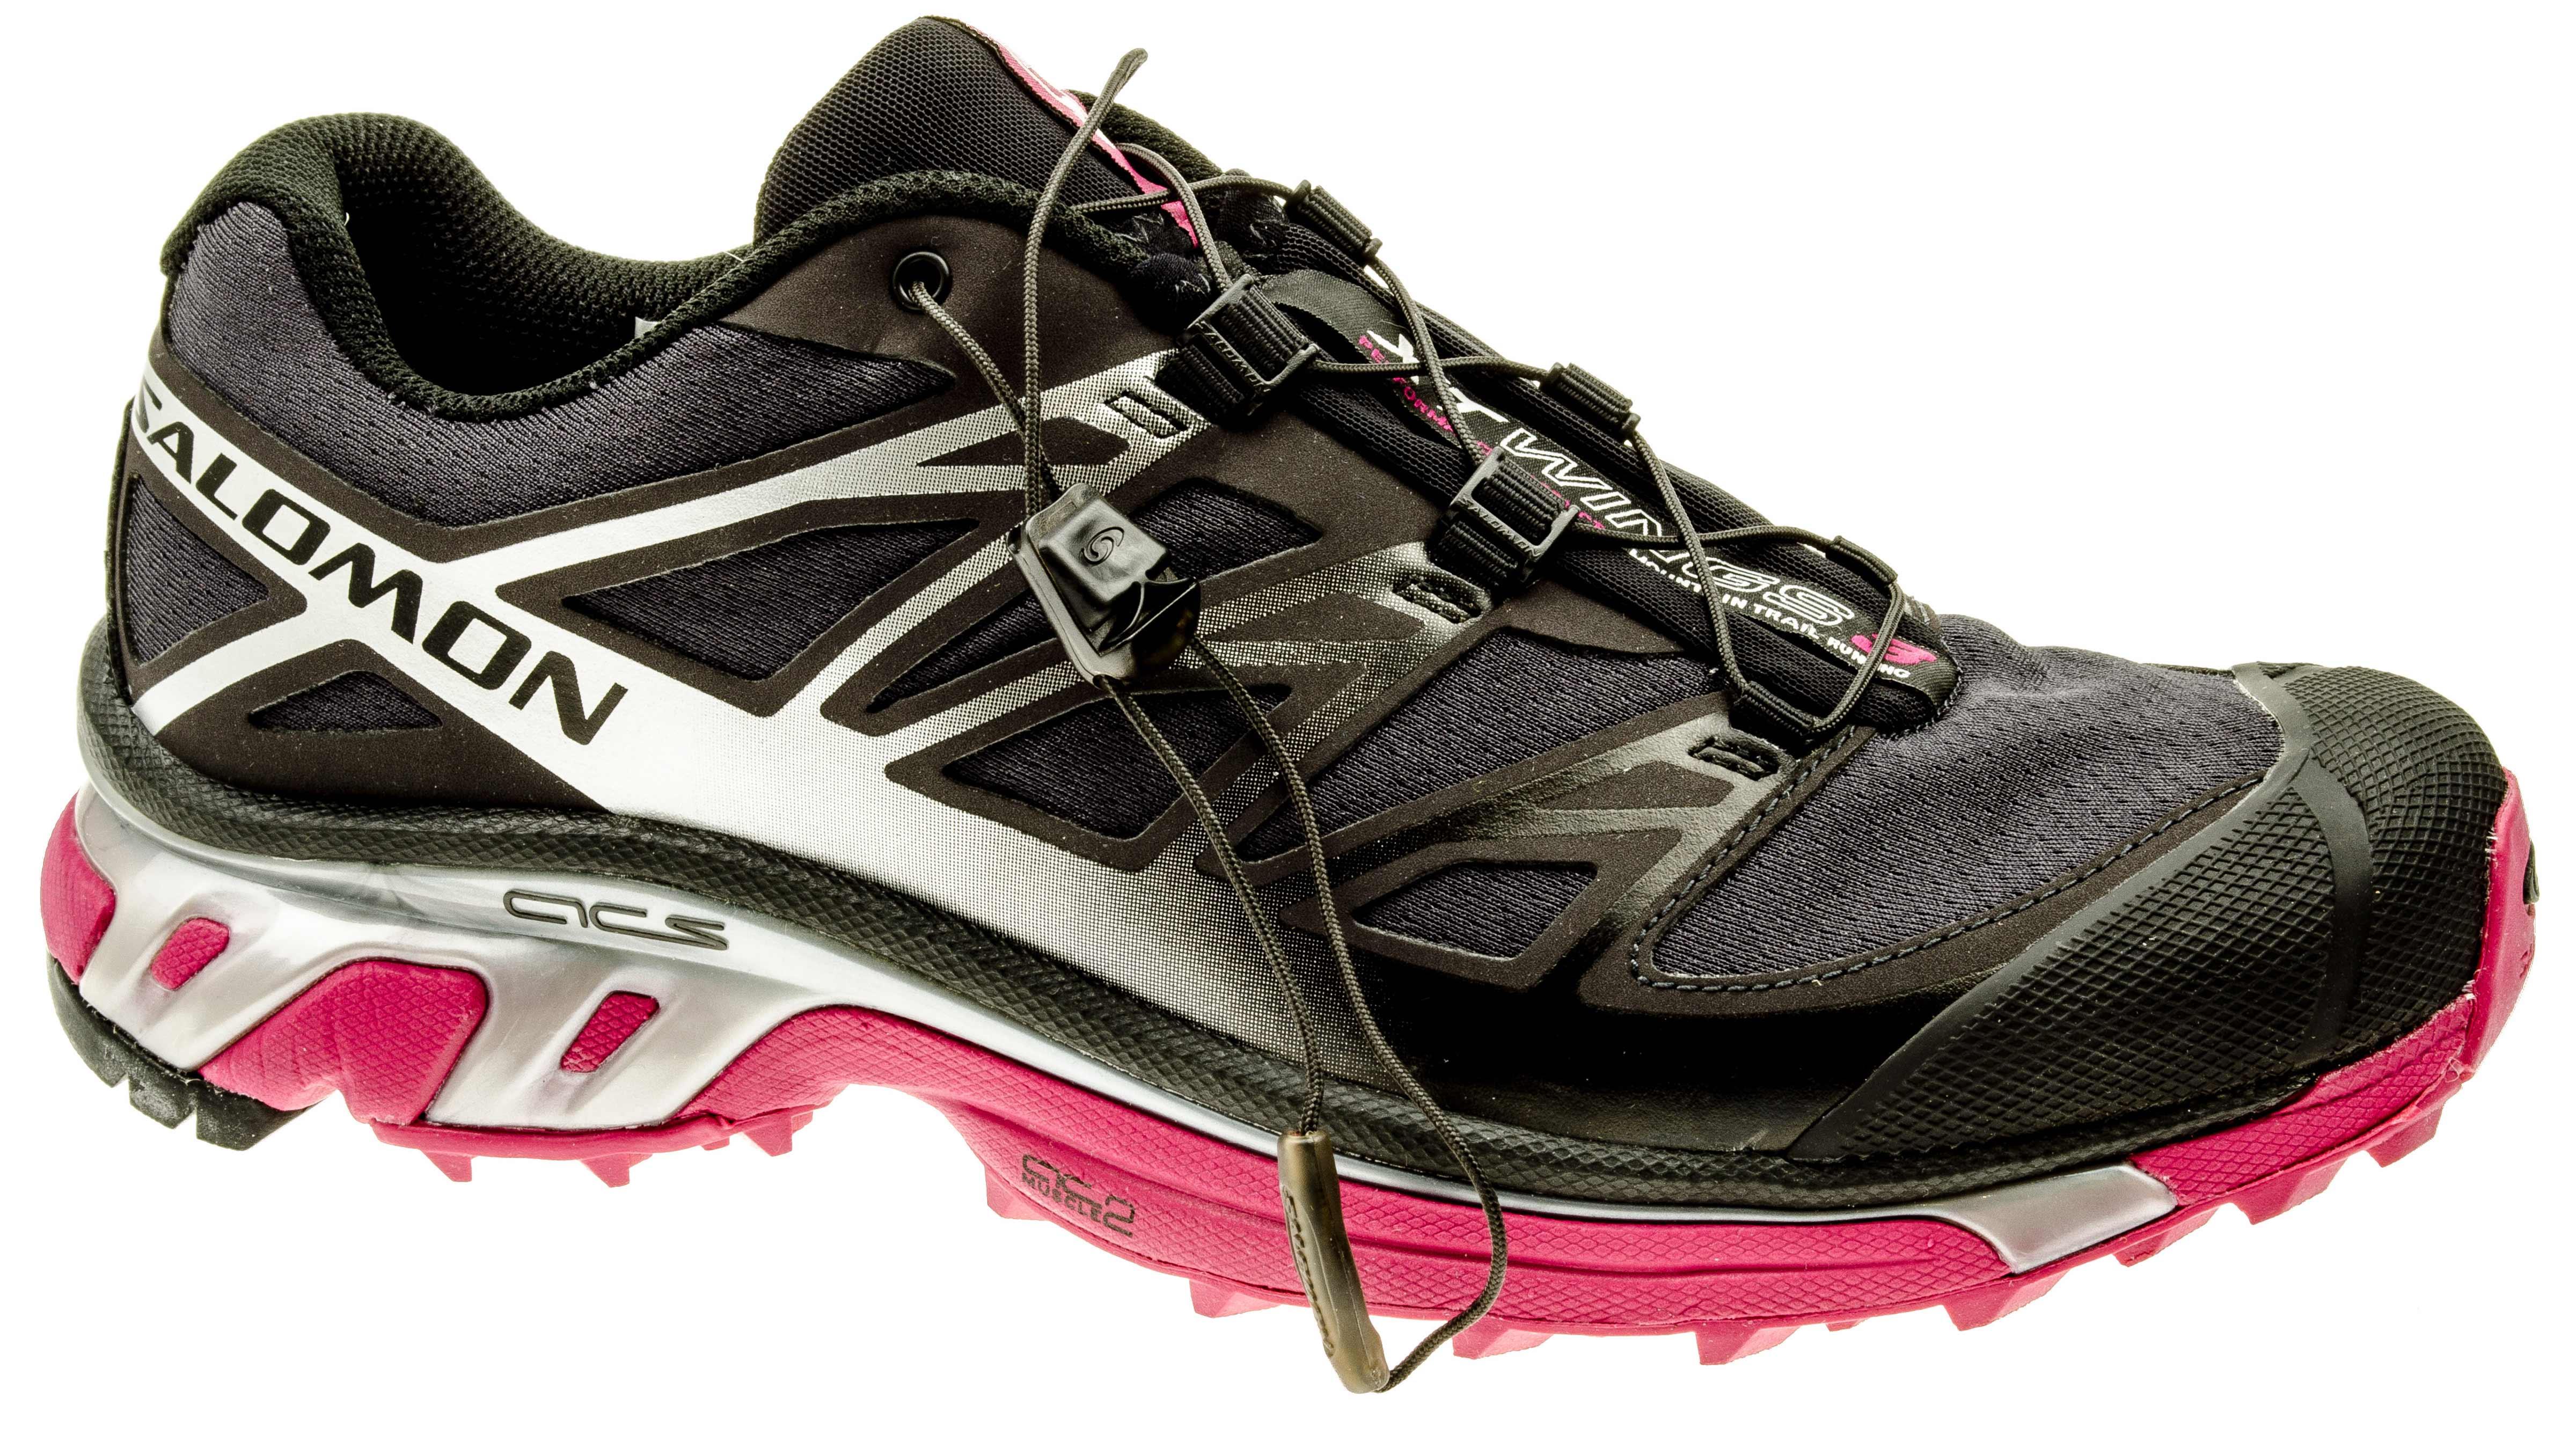 online retailer 91344 22052 ... discount code for salomon xt wings 3 asphalt silver metallic pink 174cc  145dc